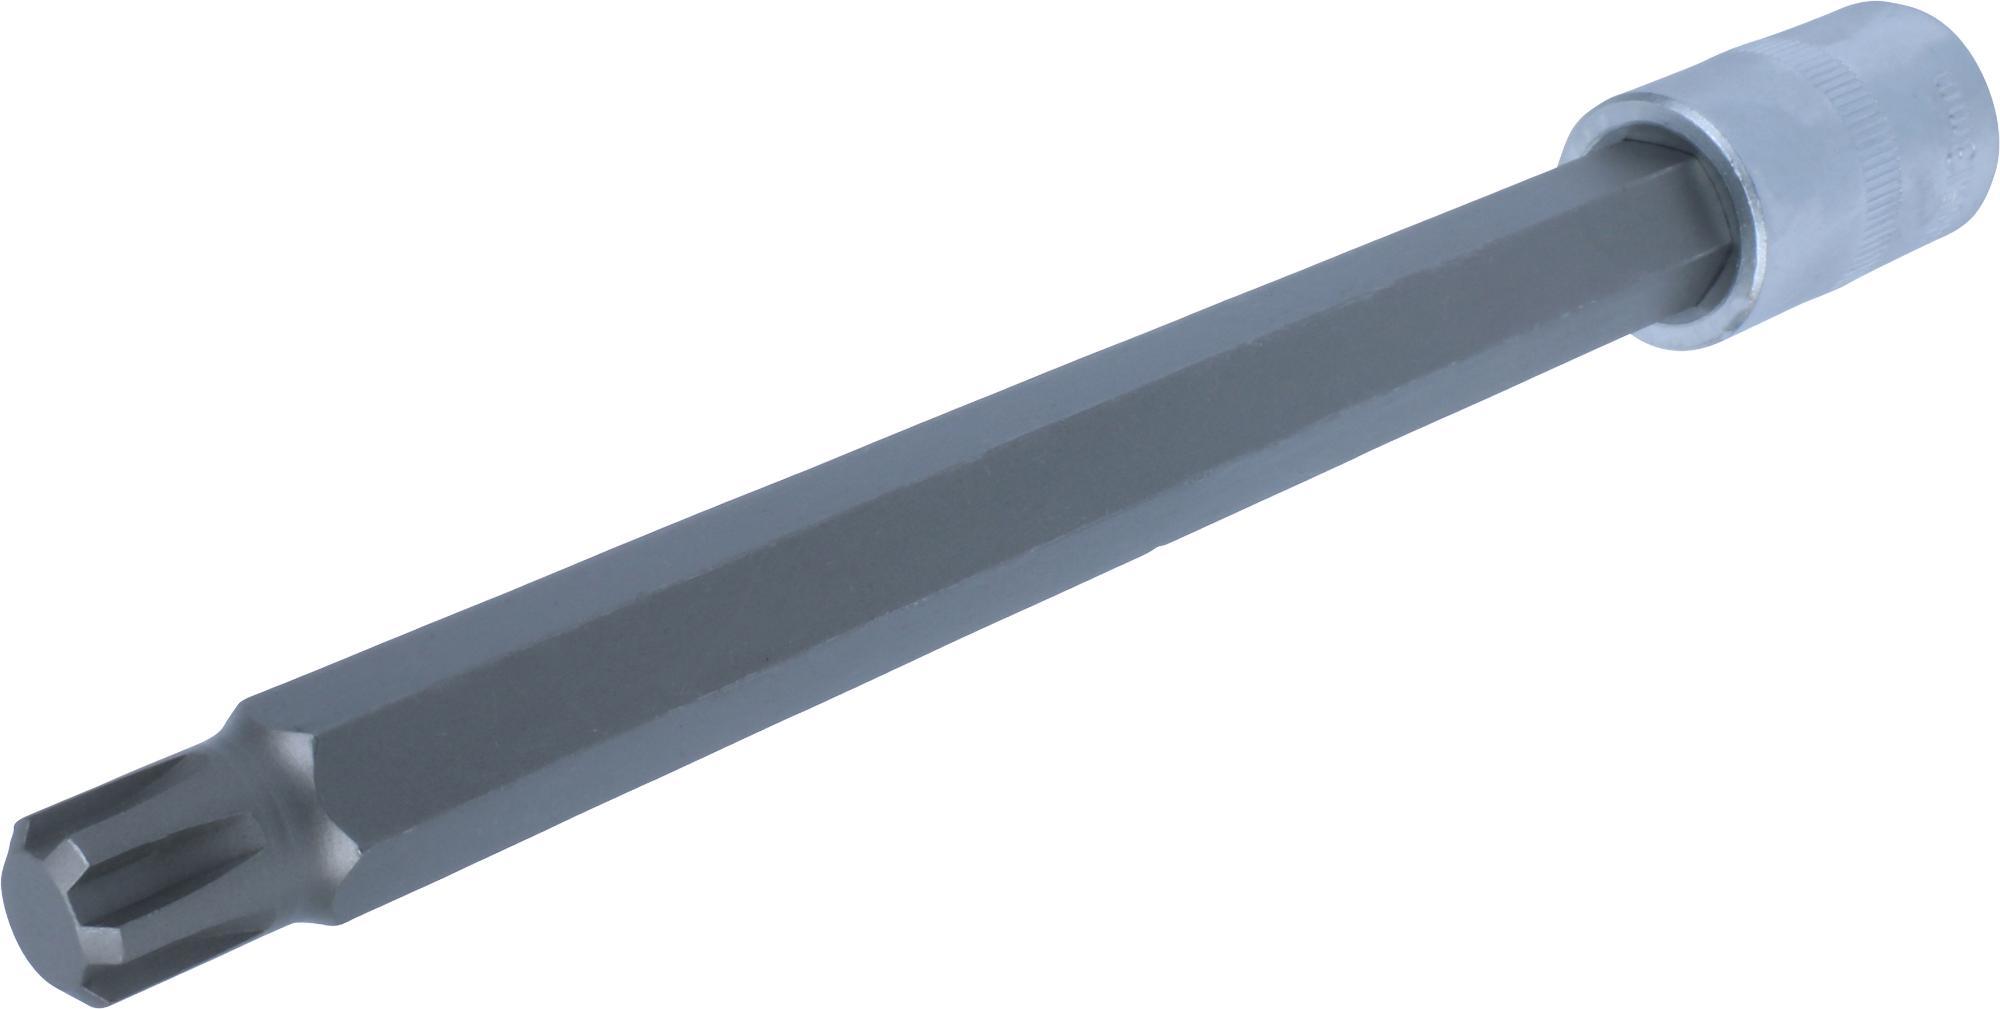 "Nástavec, 1/2"", Keilnut M13x200 mm"